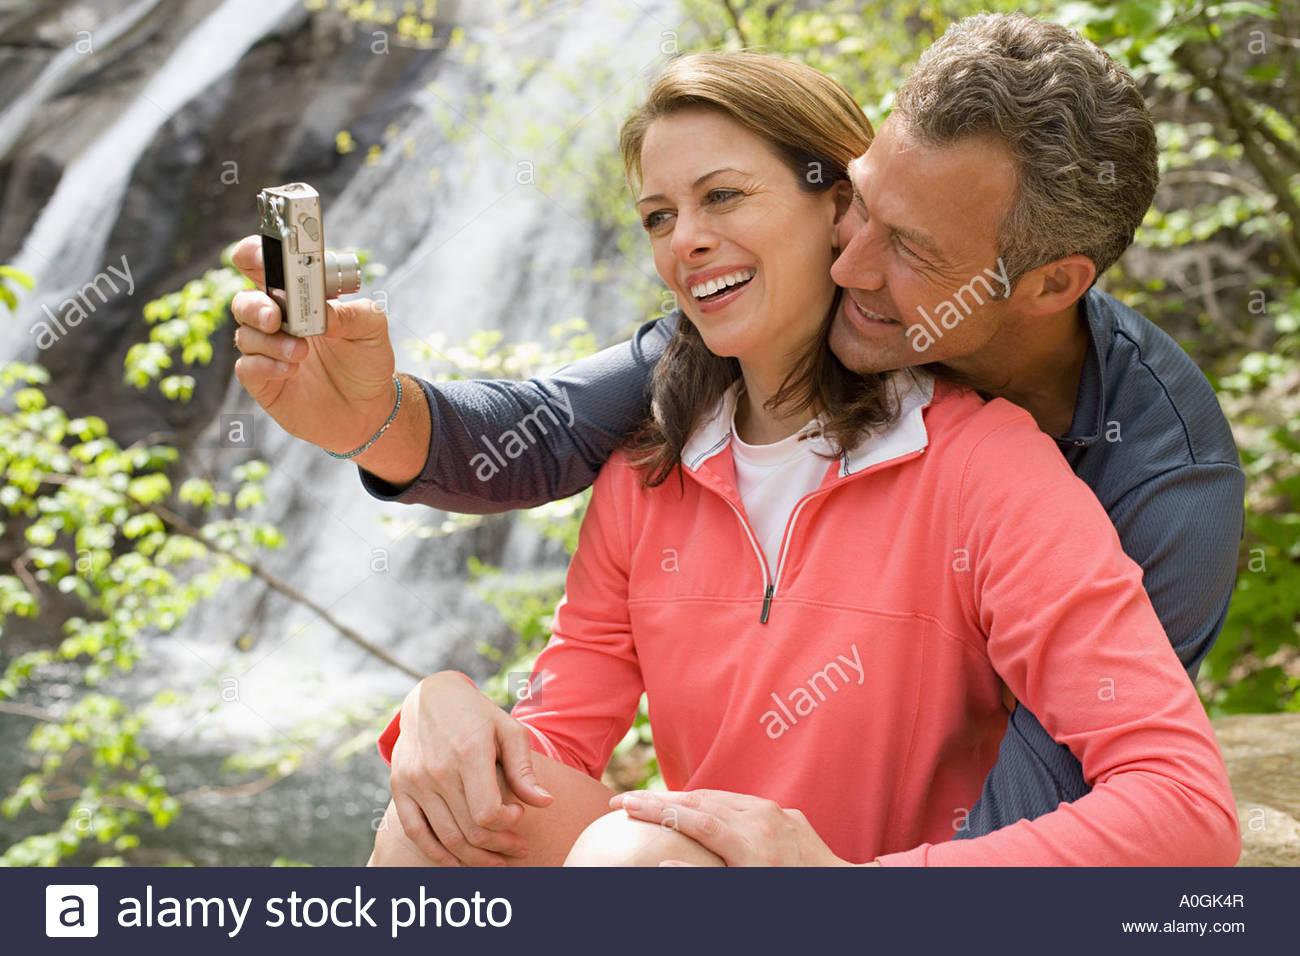 Couple taking a self portrait photograph Stock Photo